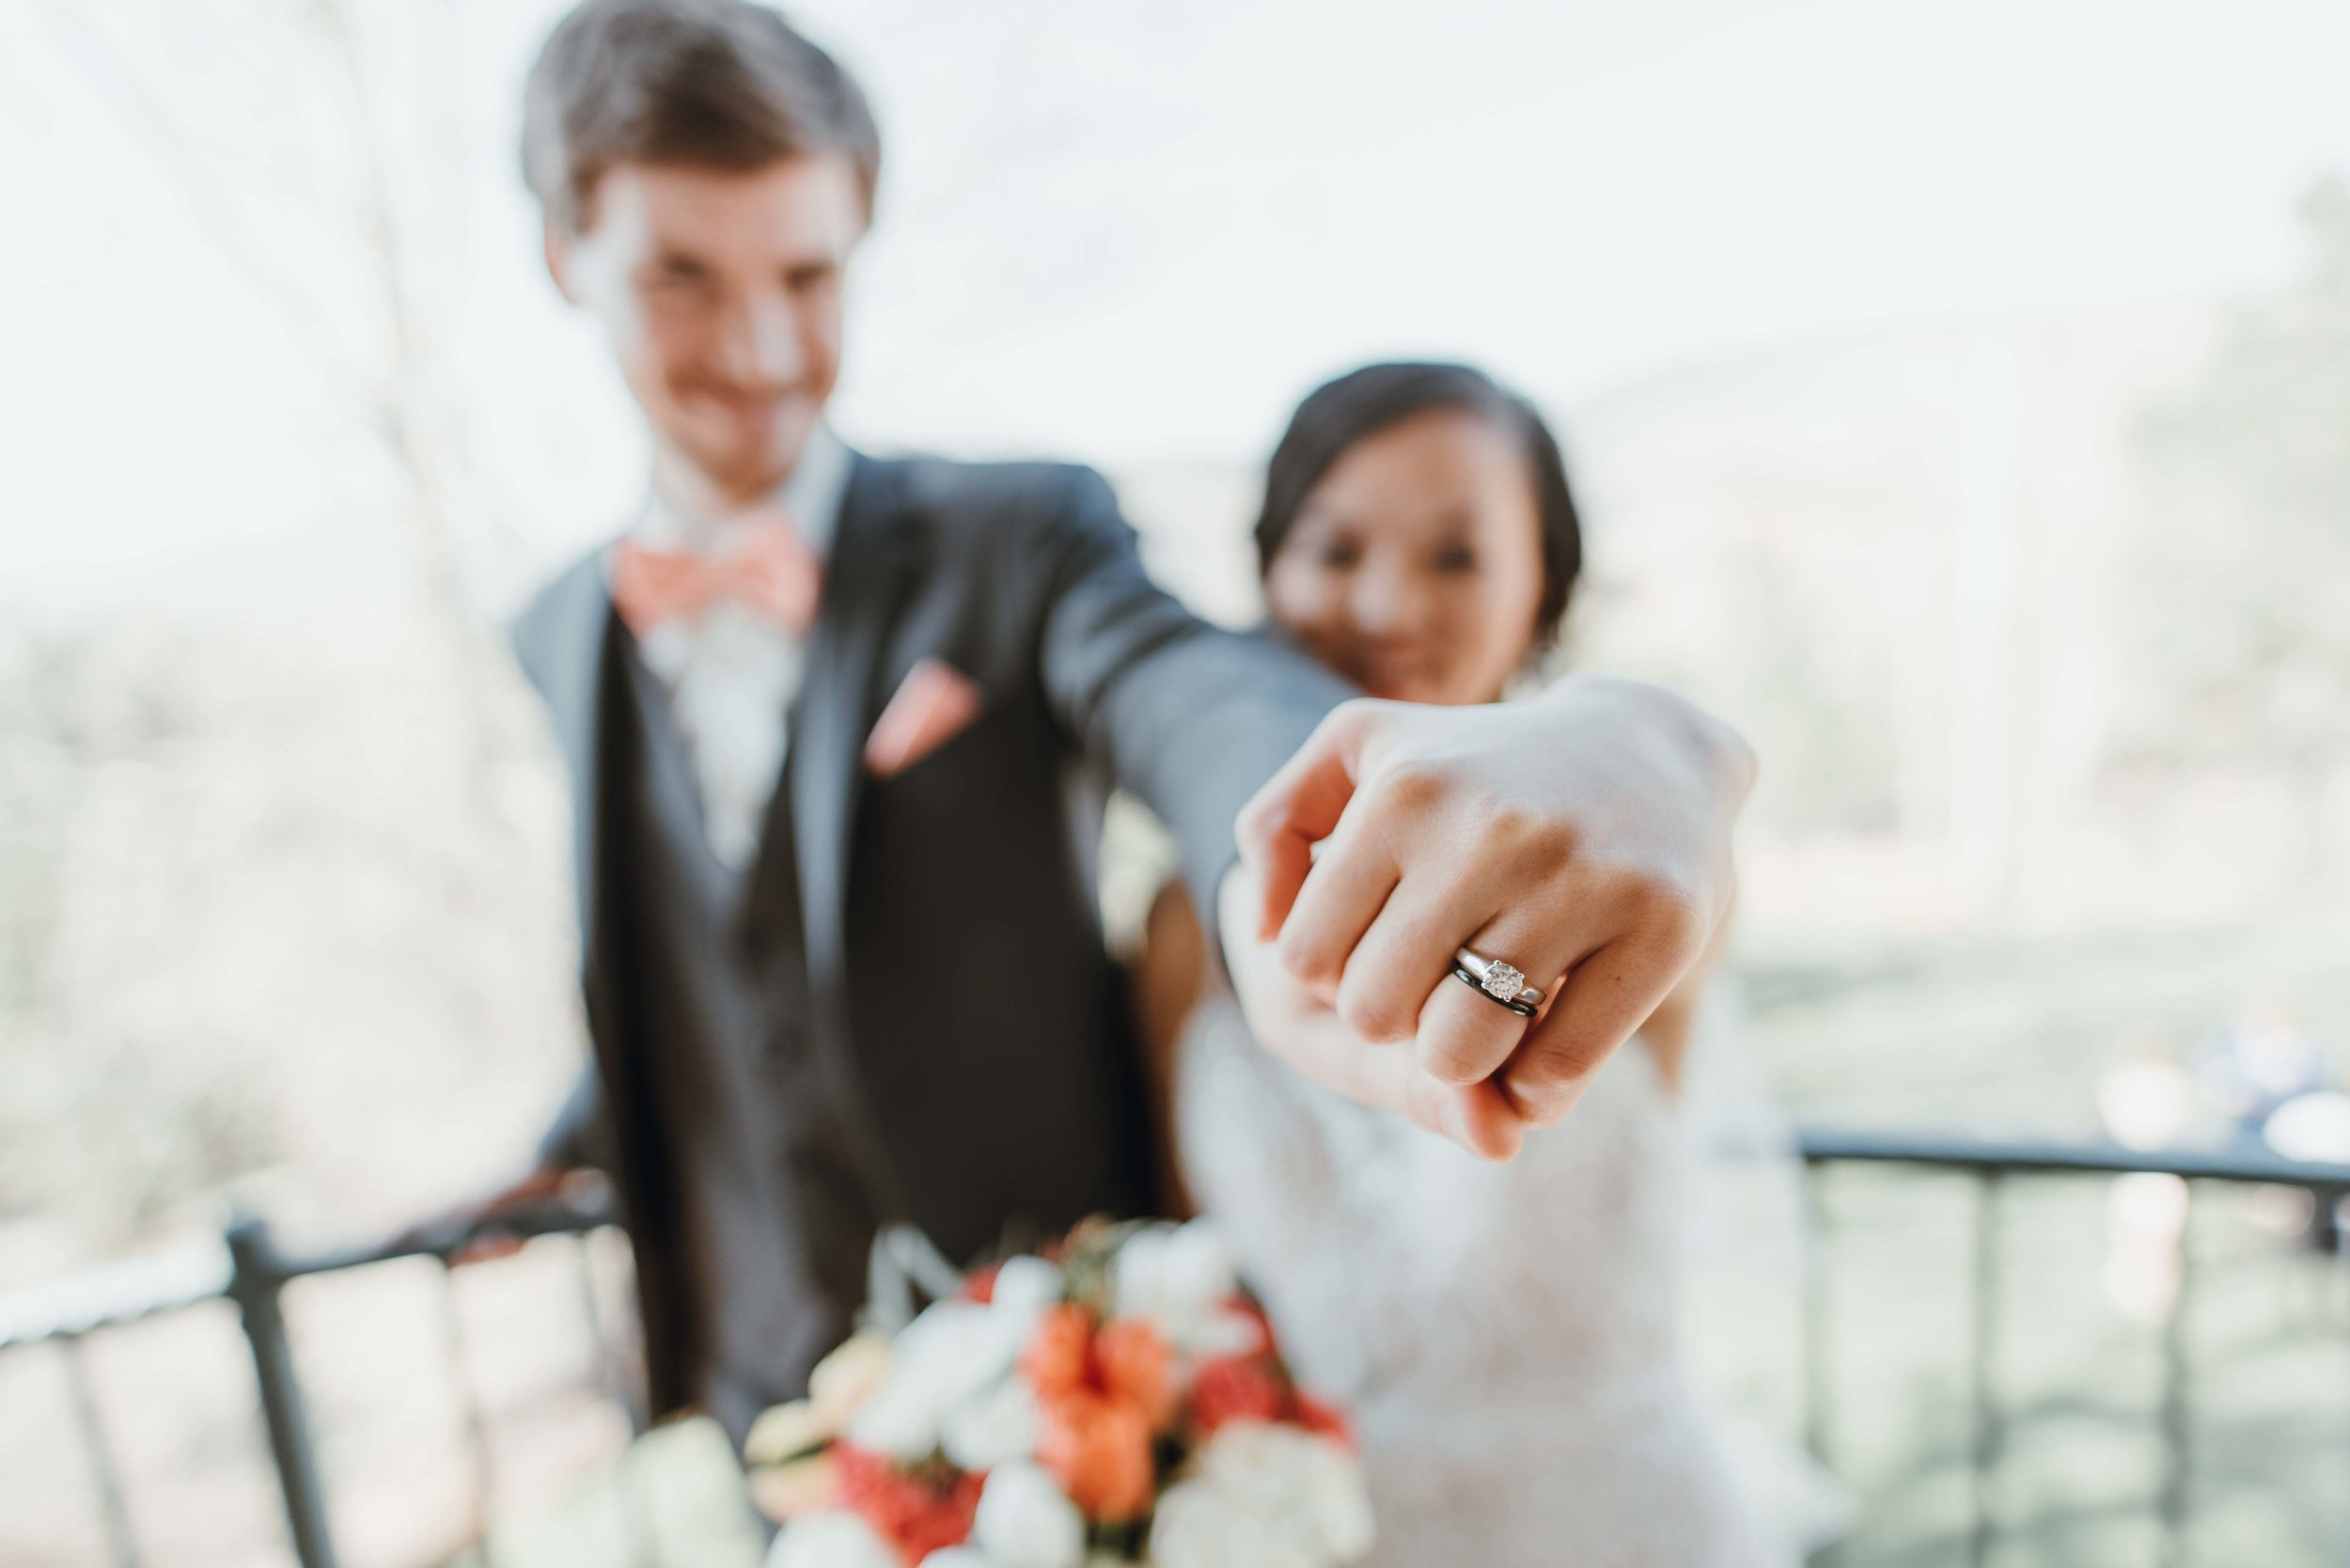 denver wedding photographer lioncrest manor in lyons ben and mali -DSC_0229.jpg